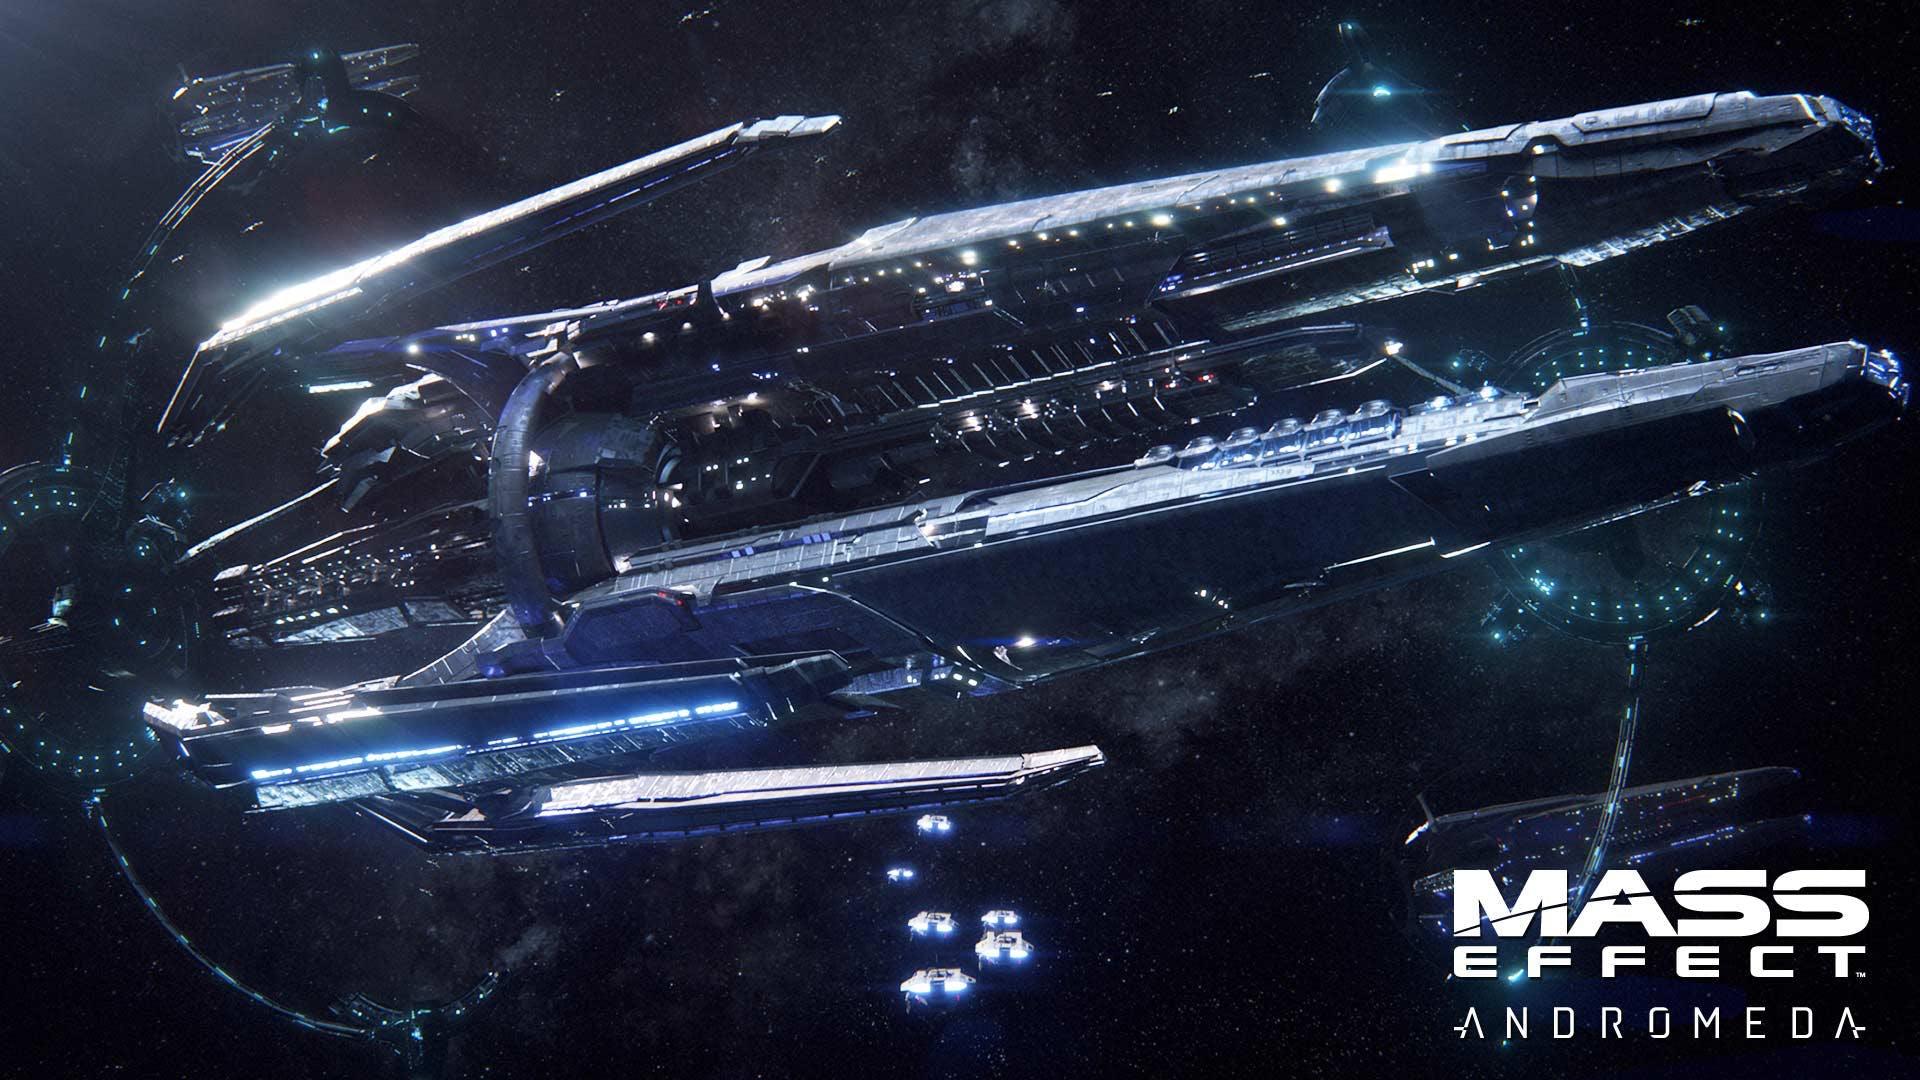 Mass Effect Andromeda teaser